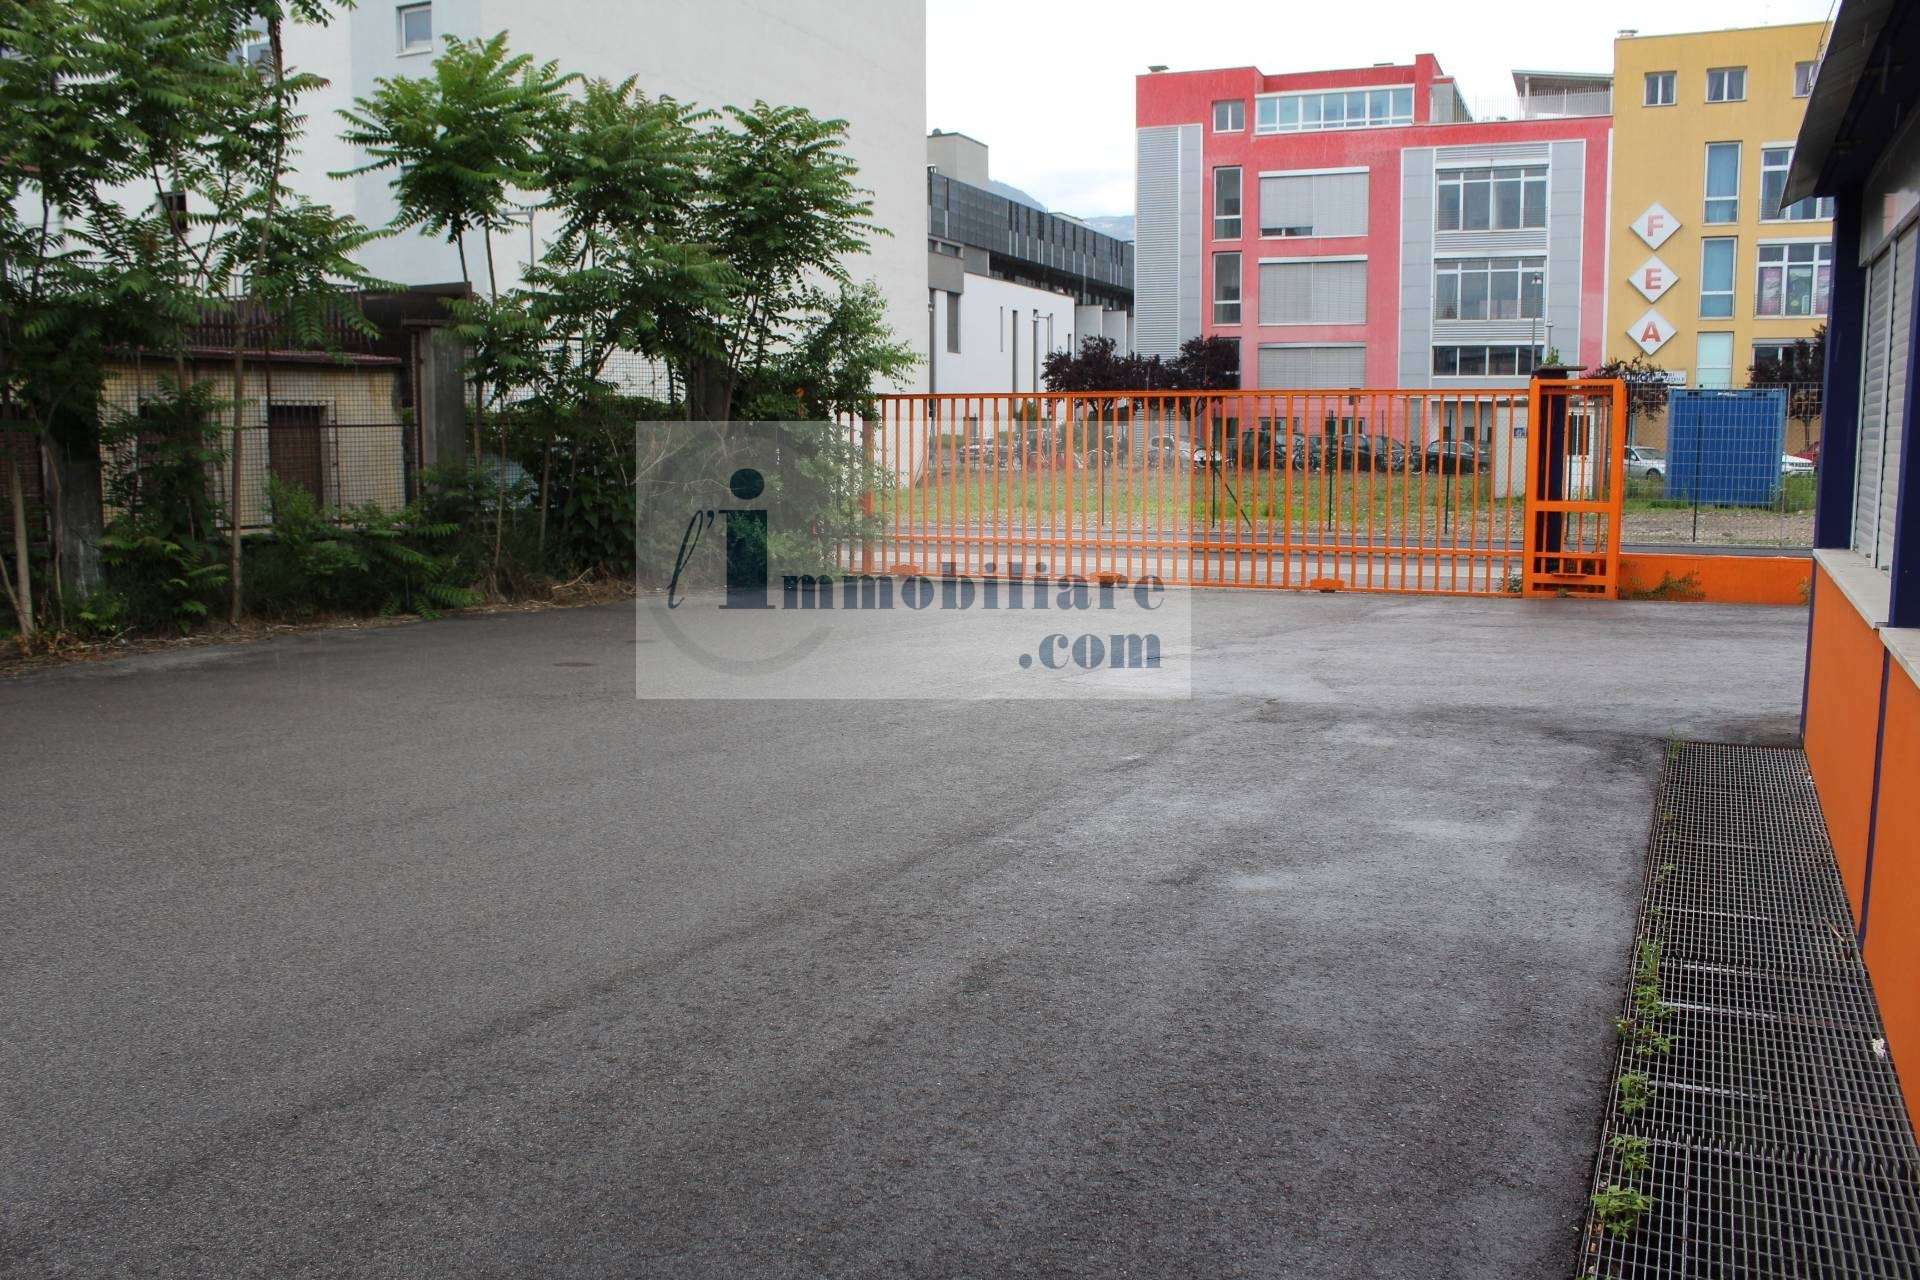 Immobili commerciali in affitto a bolzano for Immobili commerciali affitto roma